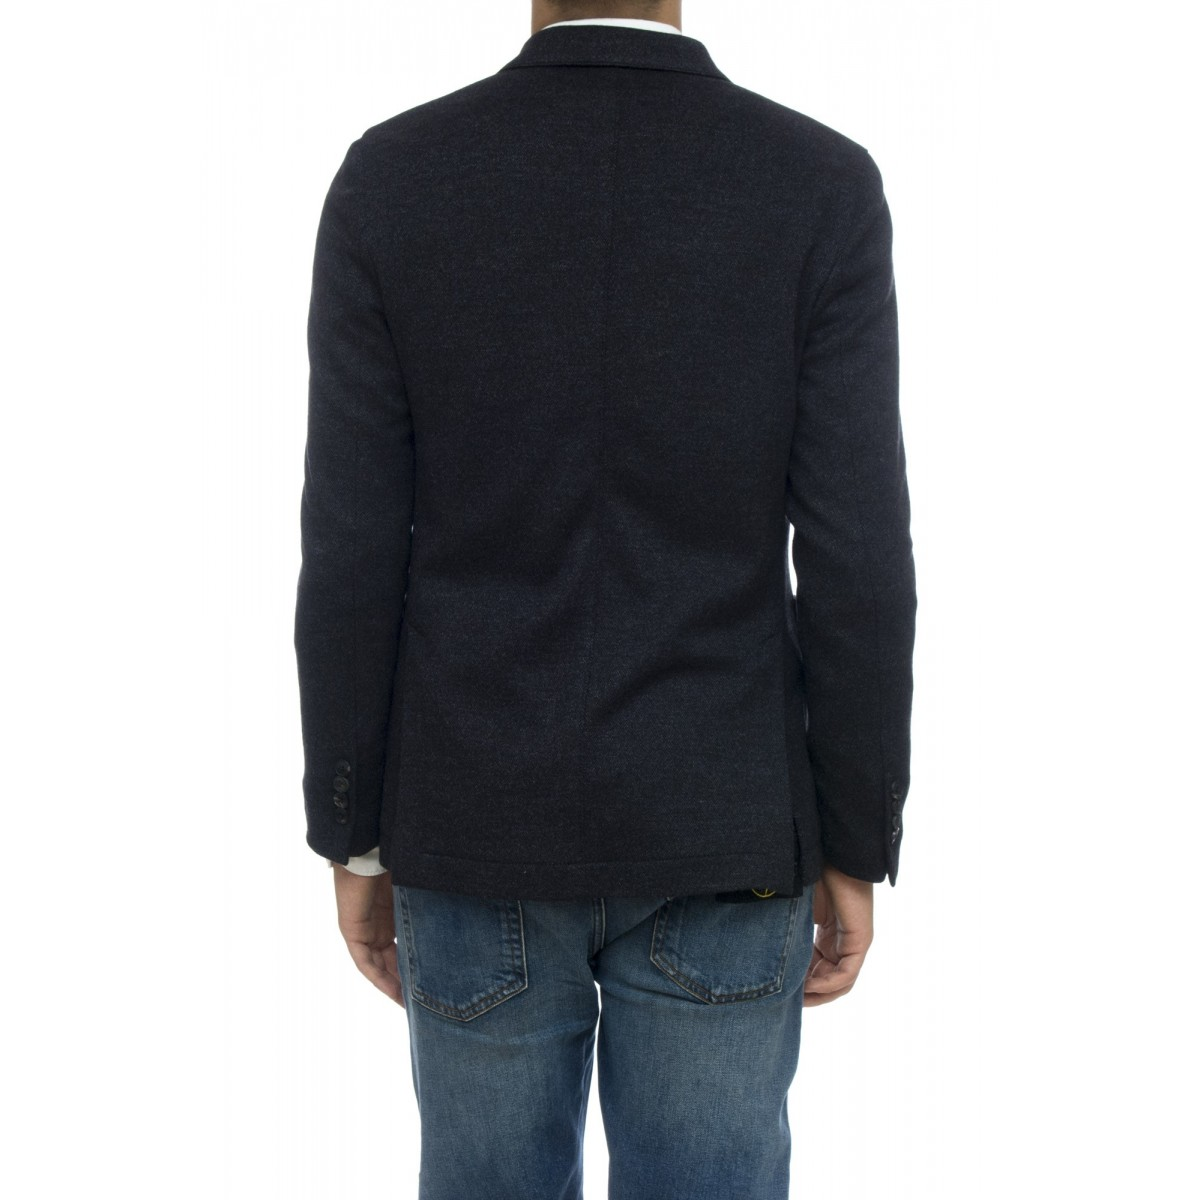 Giacca - Cn1694 giacca jersey lana